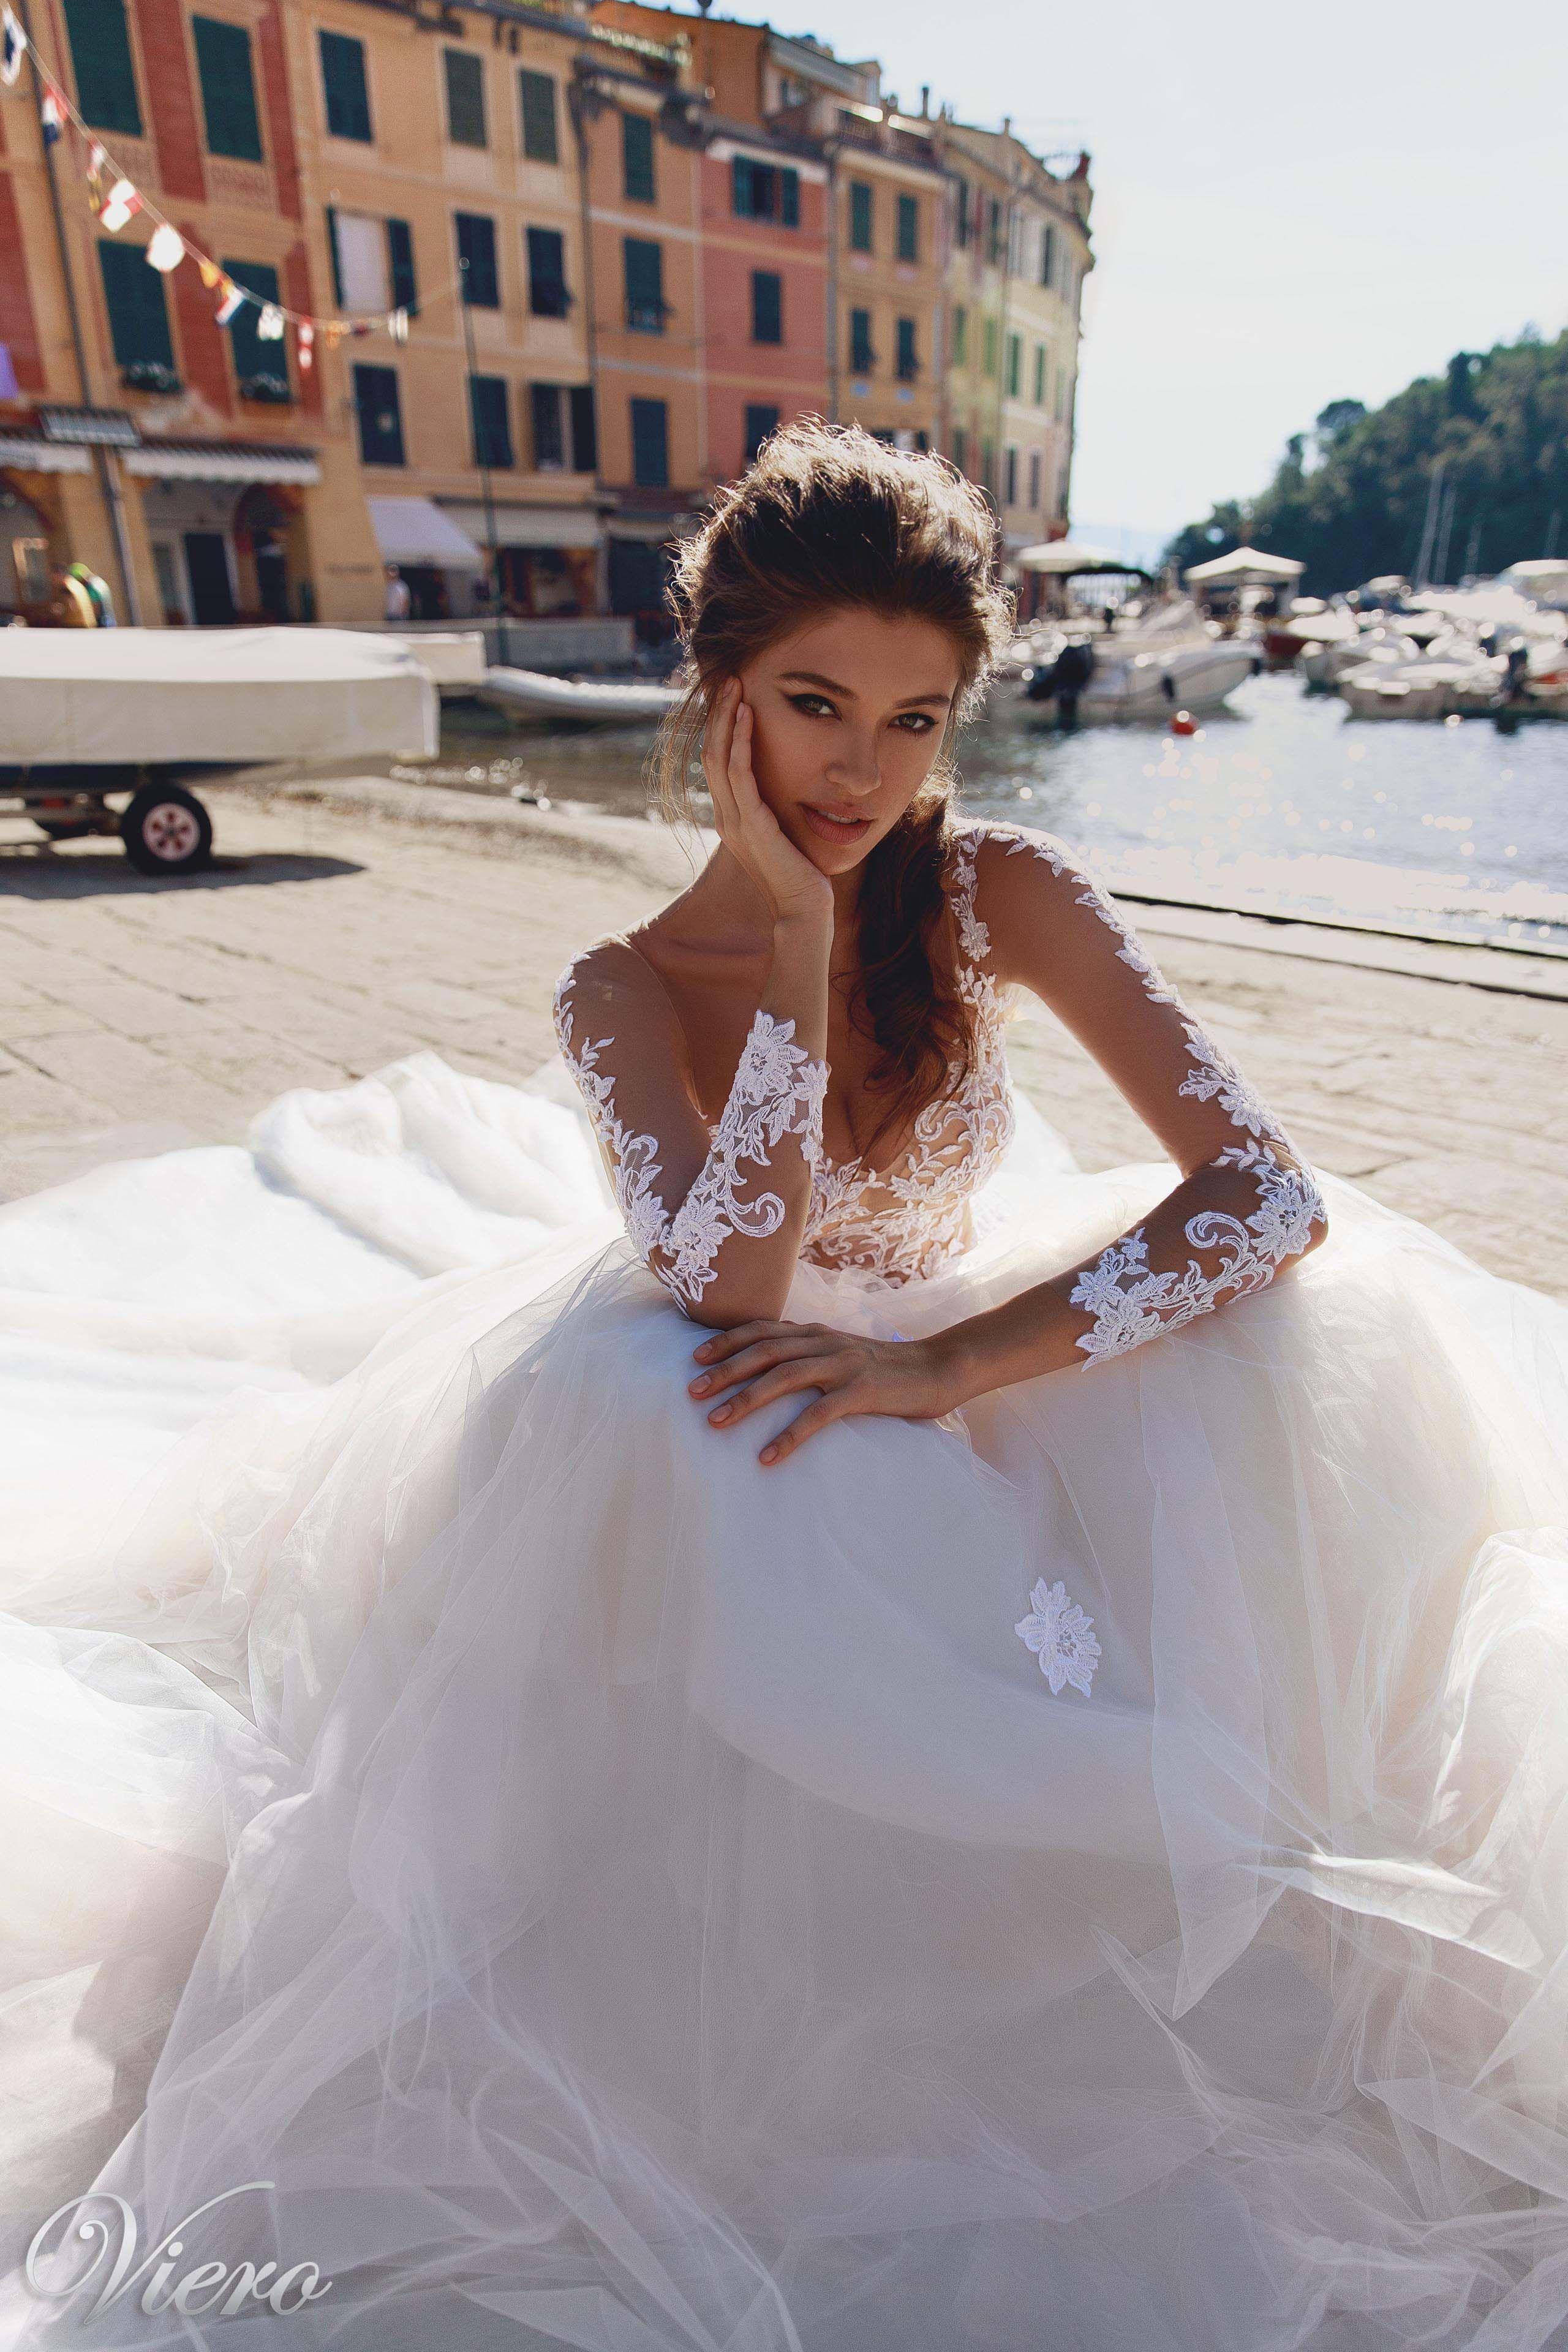 Wedding Dress Maker | Wedding dress princess, Princess wedding ...